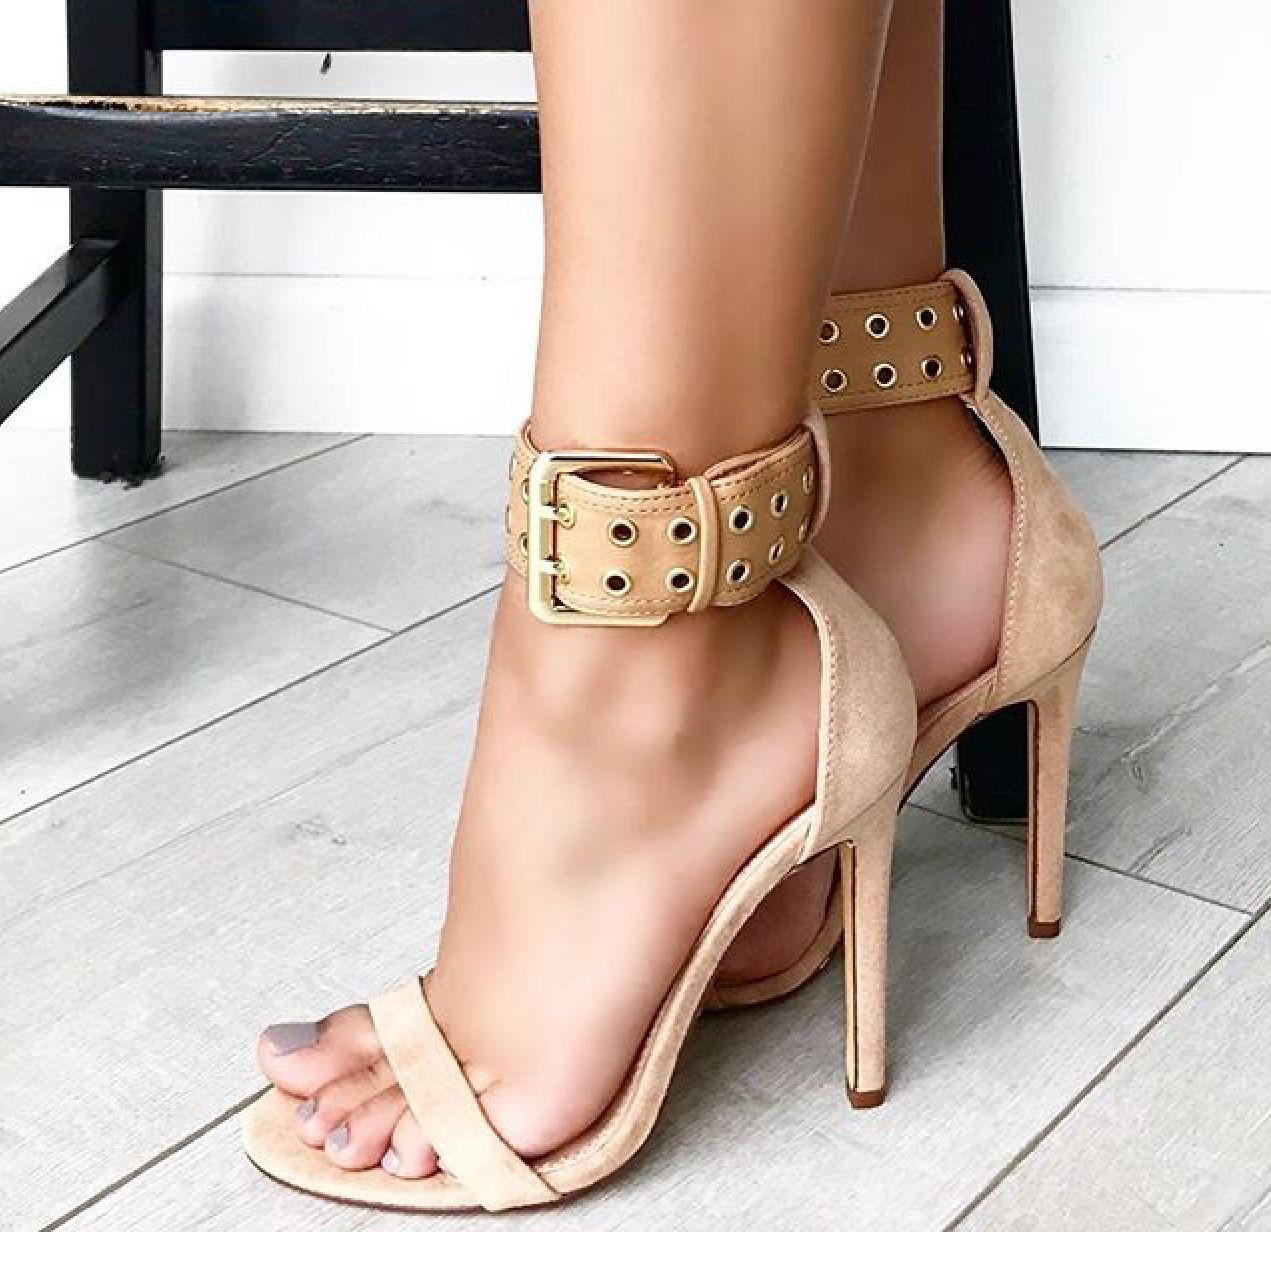 Pin Zapatos Sexys De Maria Murillo Alejandro En 2019 rAp0pnY